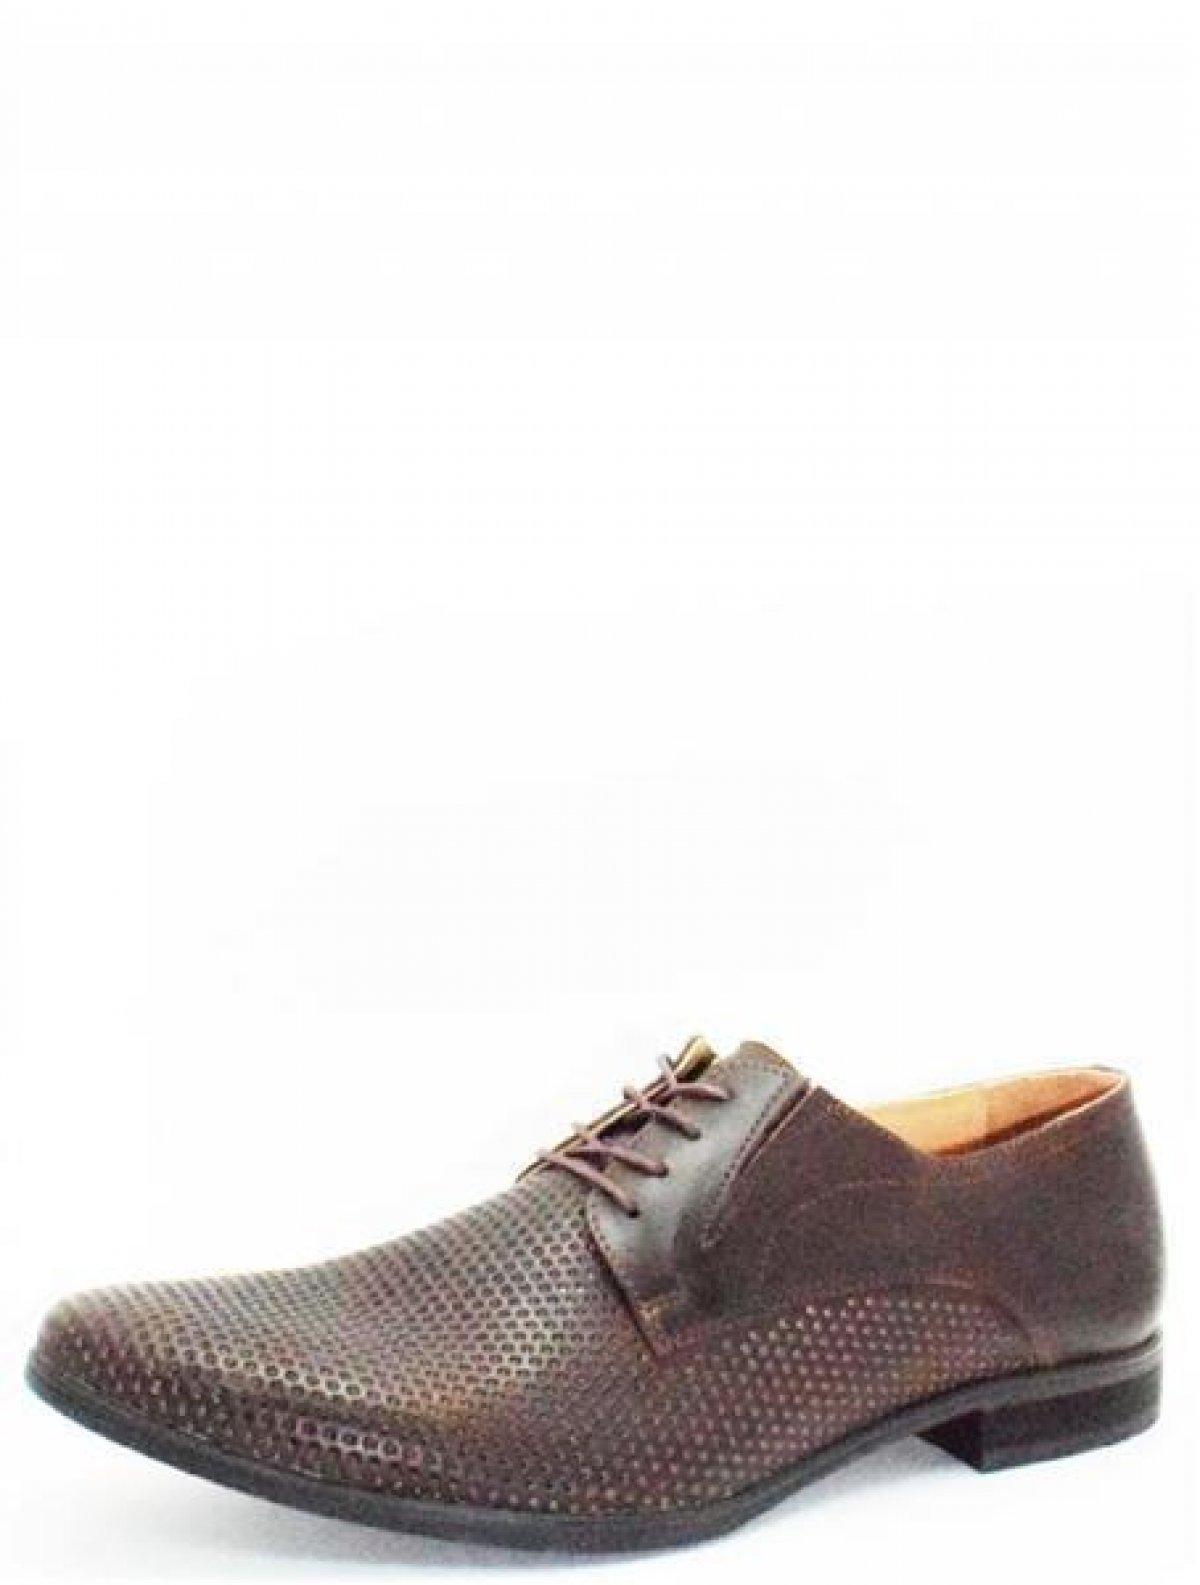 RU8423/V356 мужские туфли